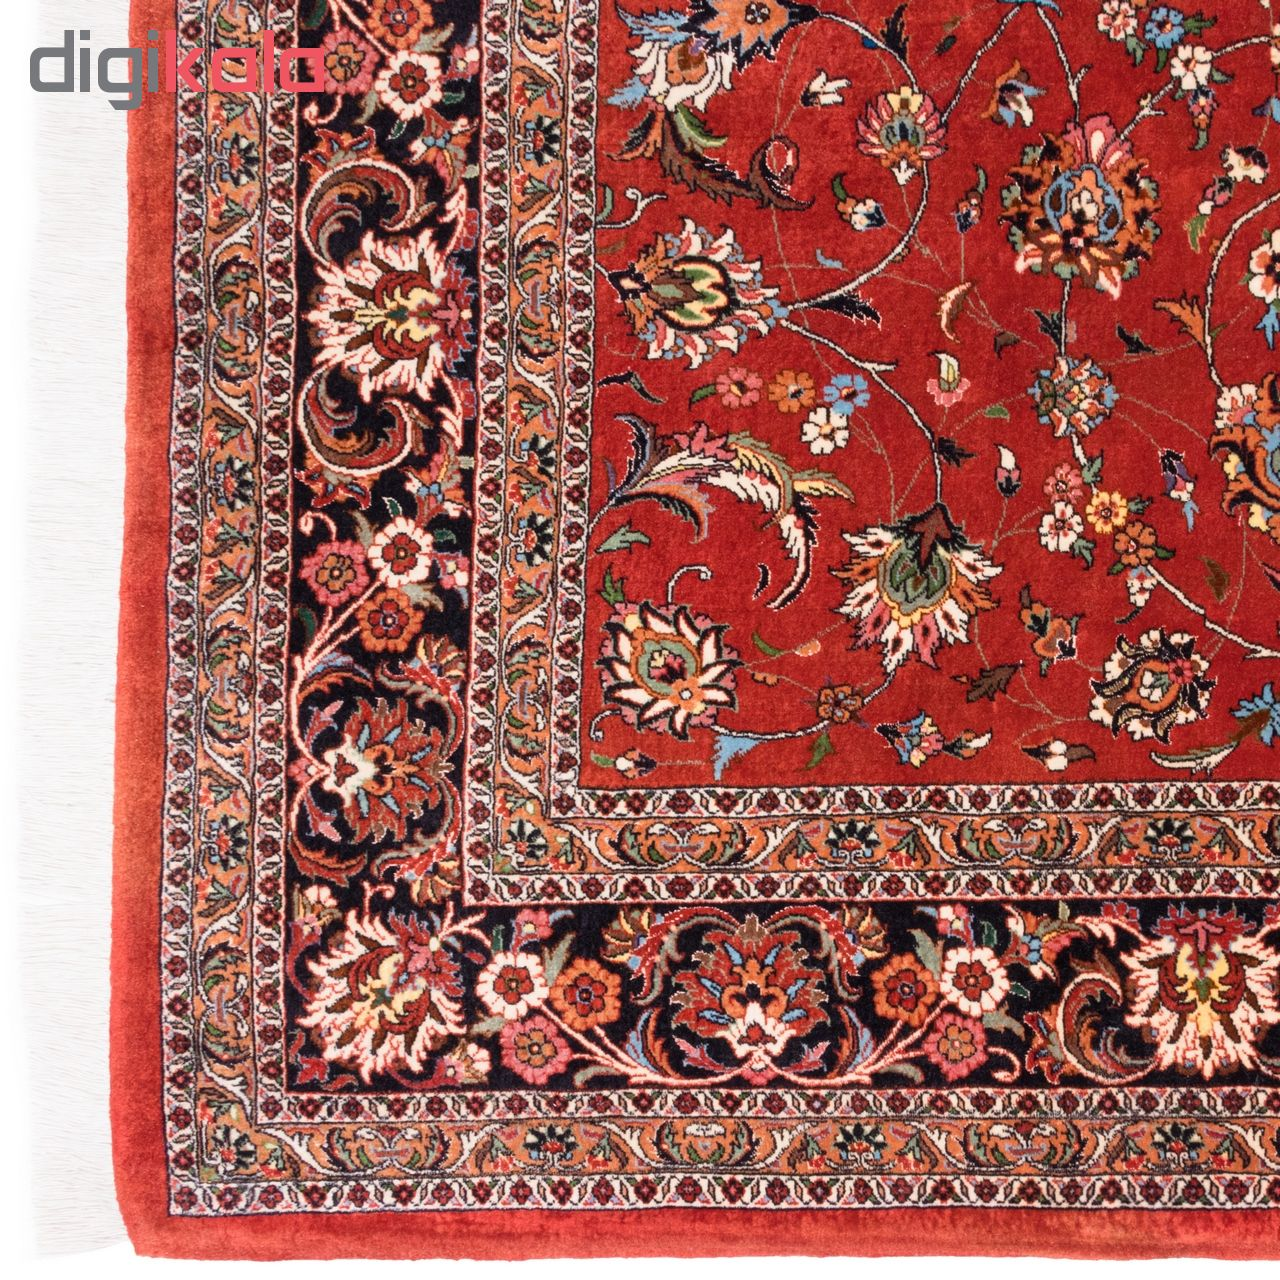 فرش دستباف شش متری سی پرشیا کد 174213